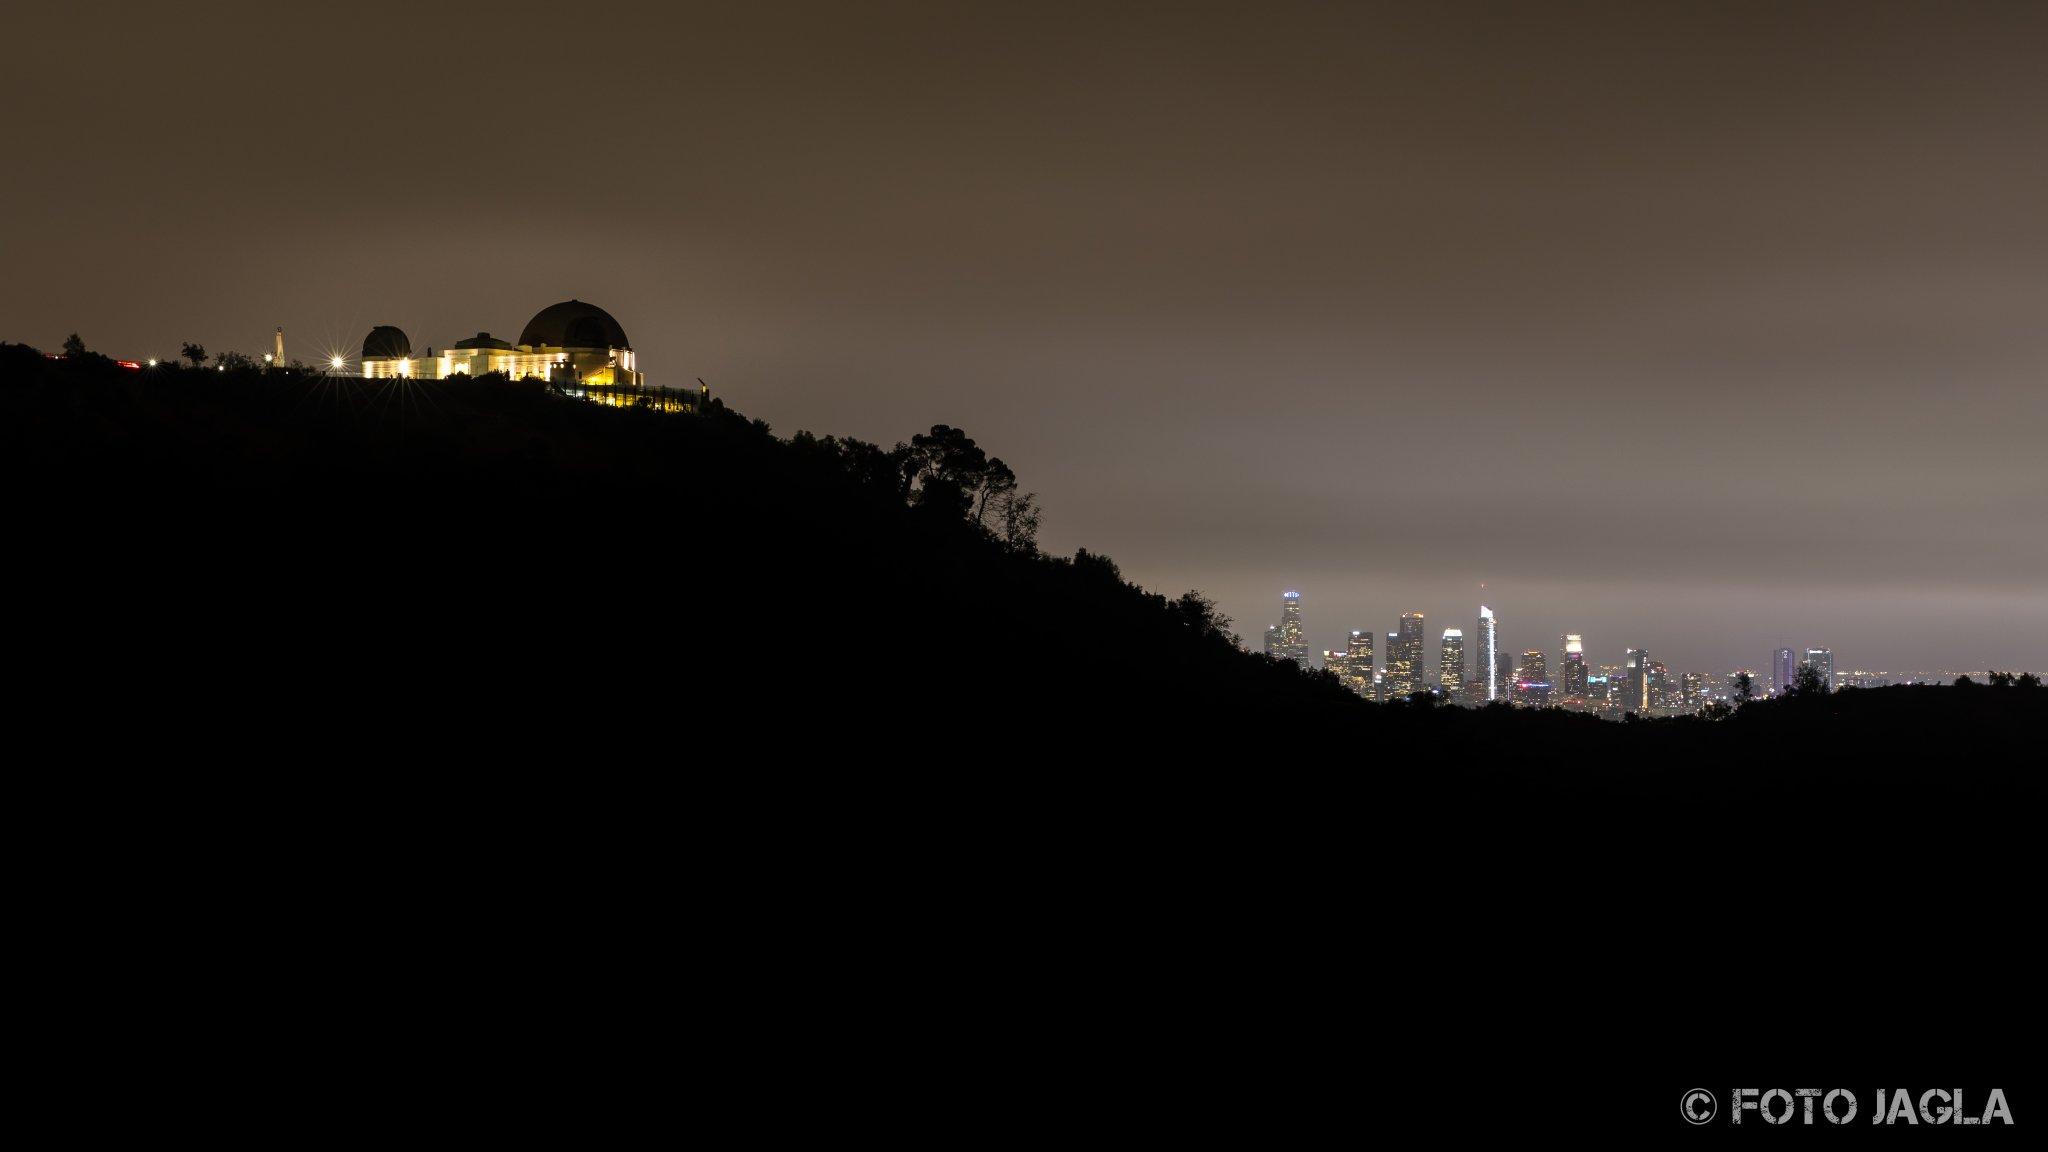 Kalifornien - September 2018 Griffith-Observatorium Los Angeles